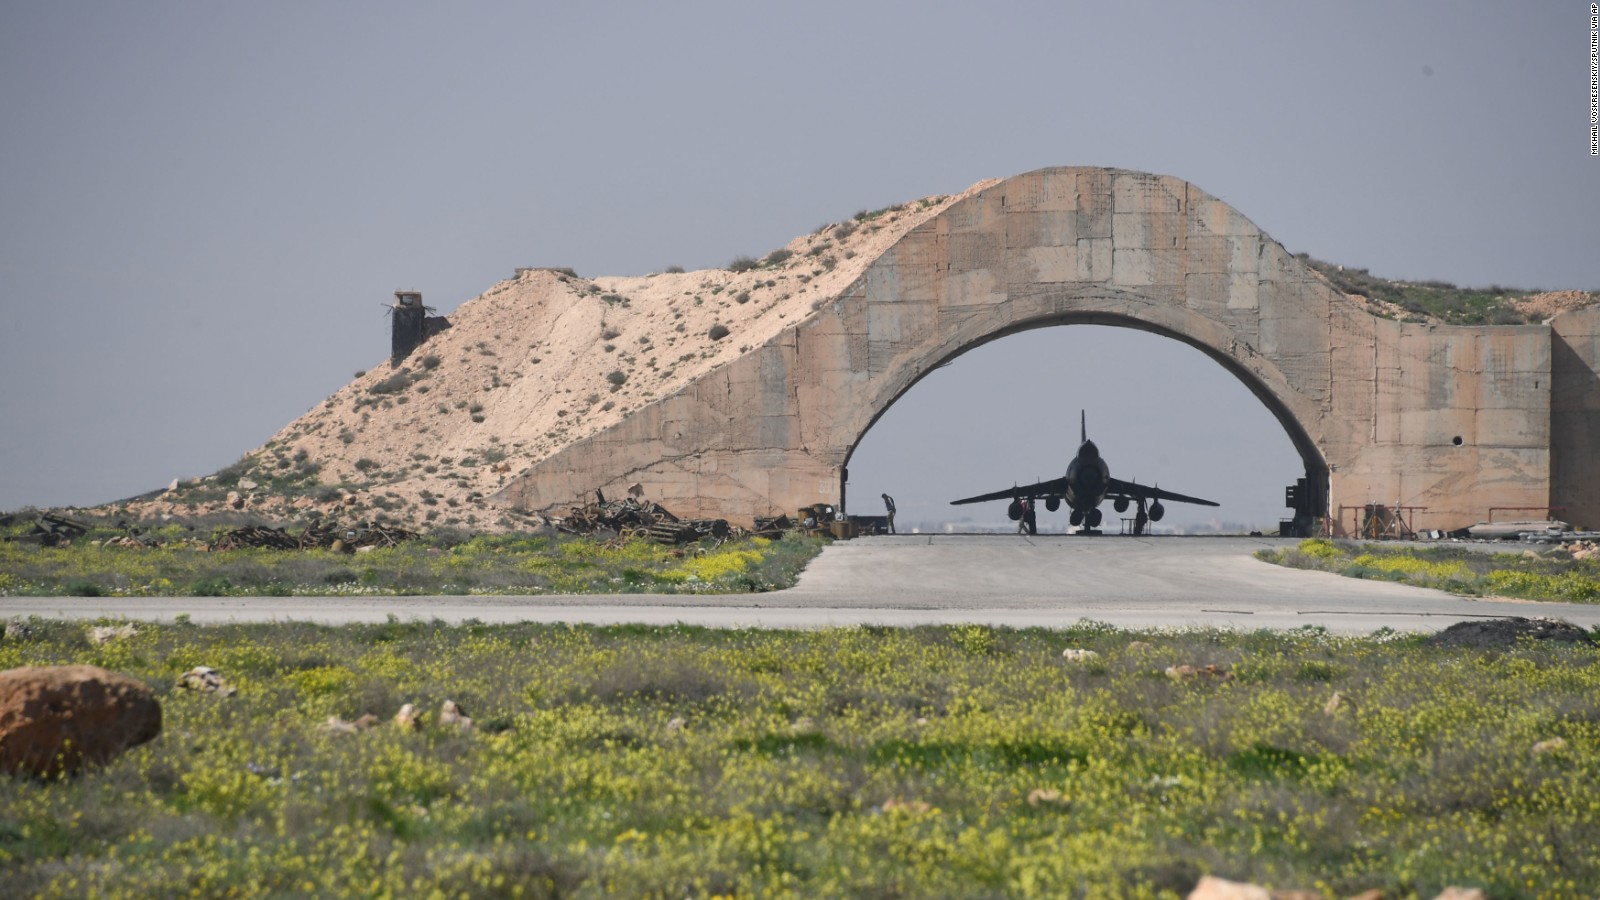 170407084557-03-us-strikes-syrian-airbase-0407-full-169.jpg